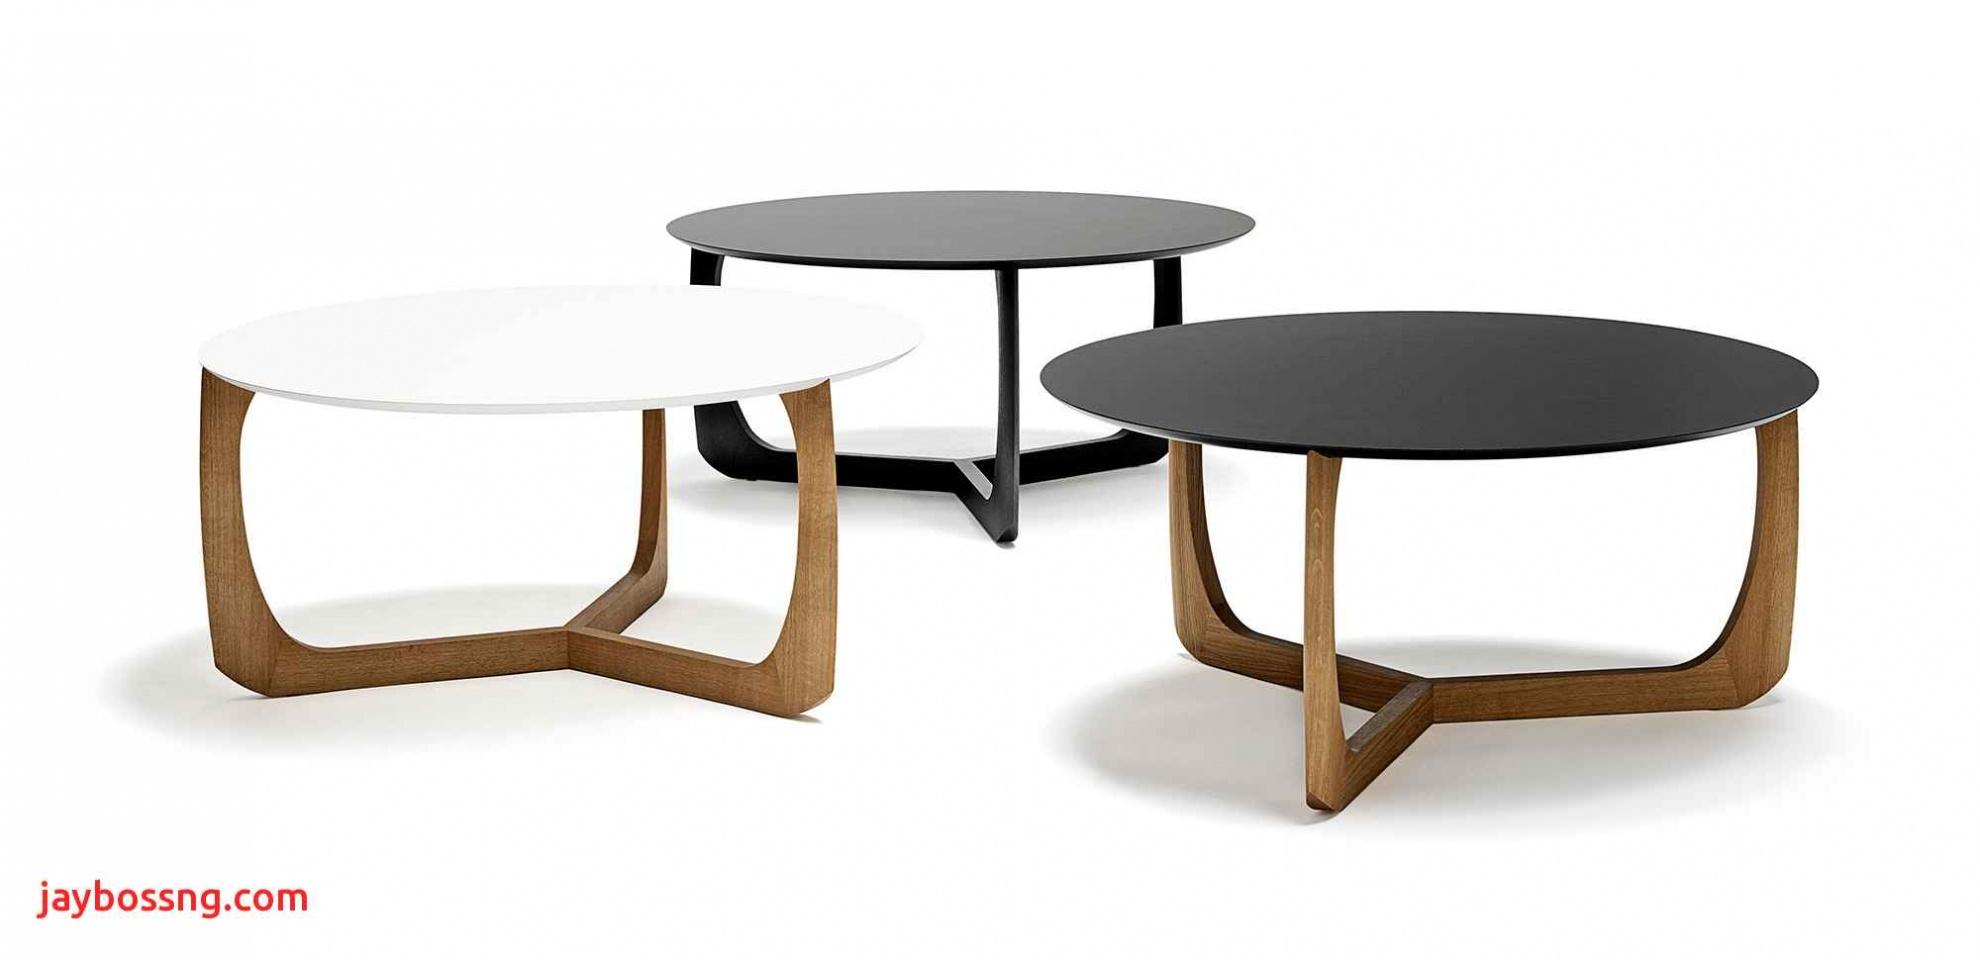 Table basse ronde fer forgé et bois